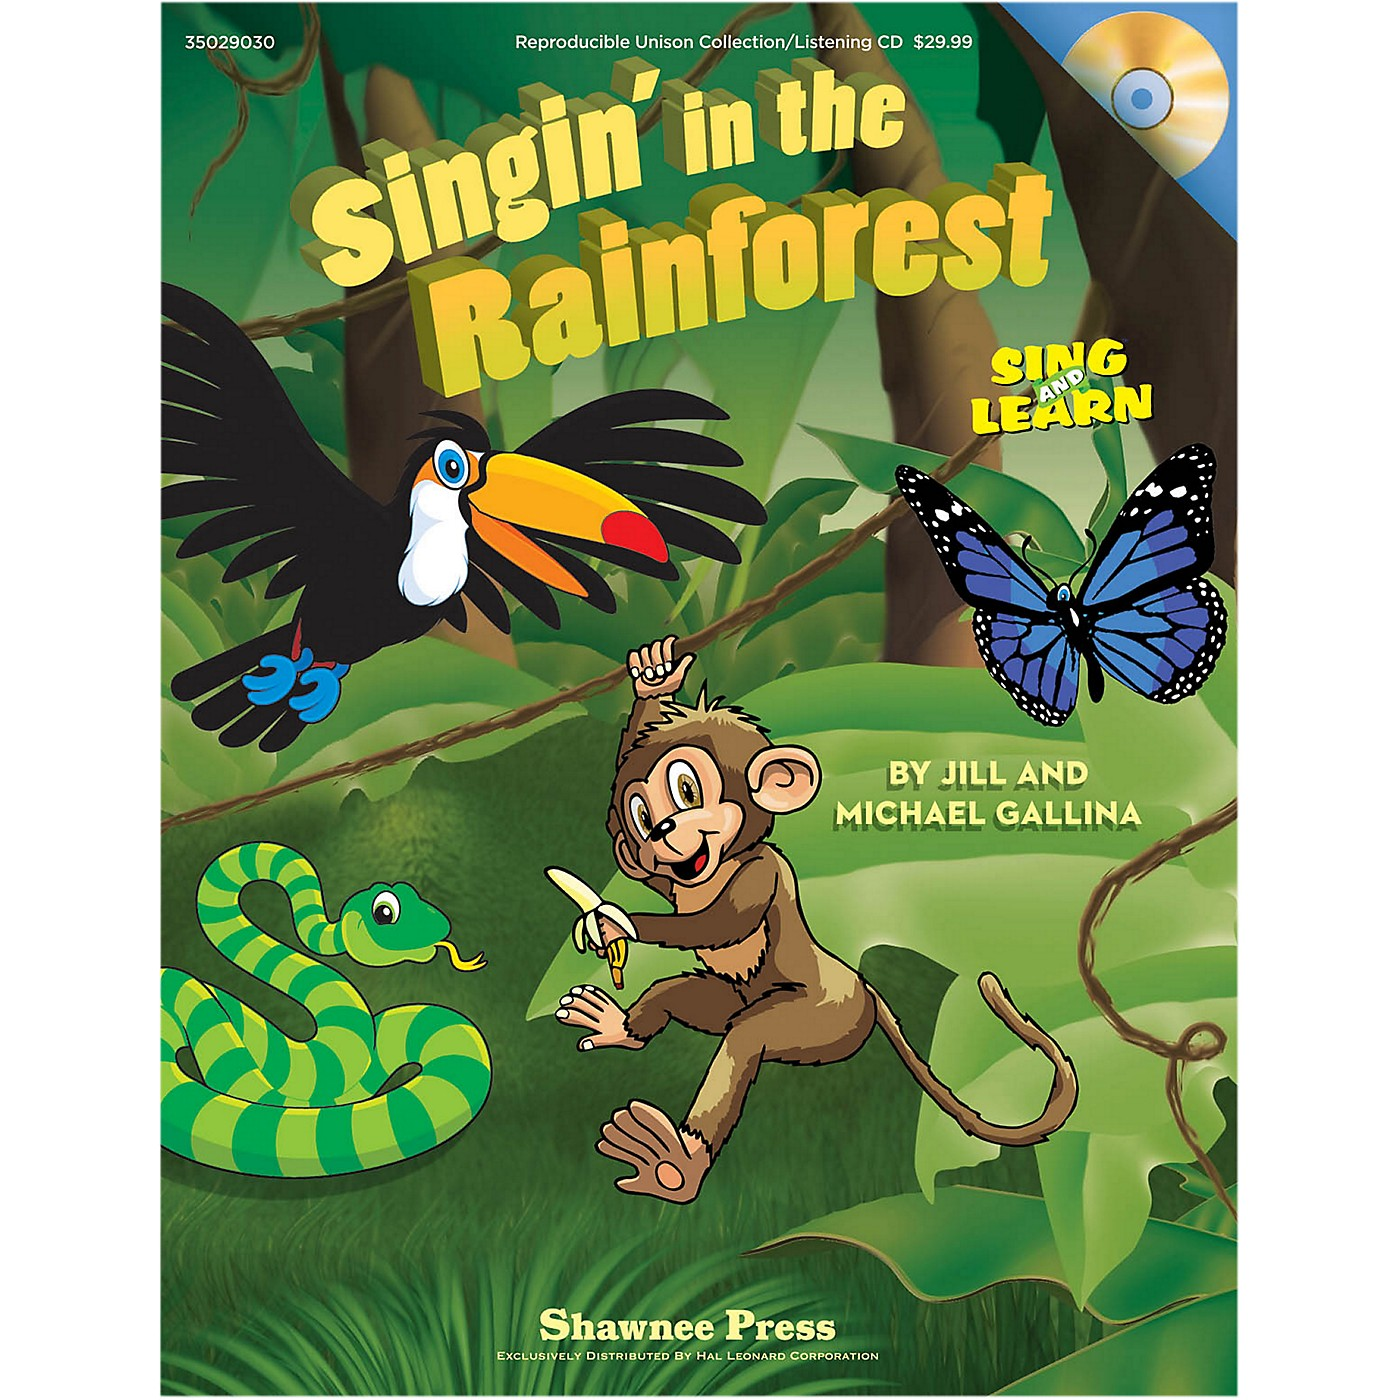 Hal Leonard Singin' In The Rainforest Book/Listening CD thumbnail